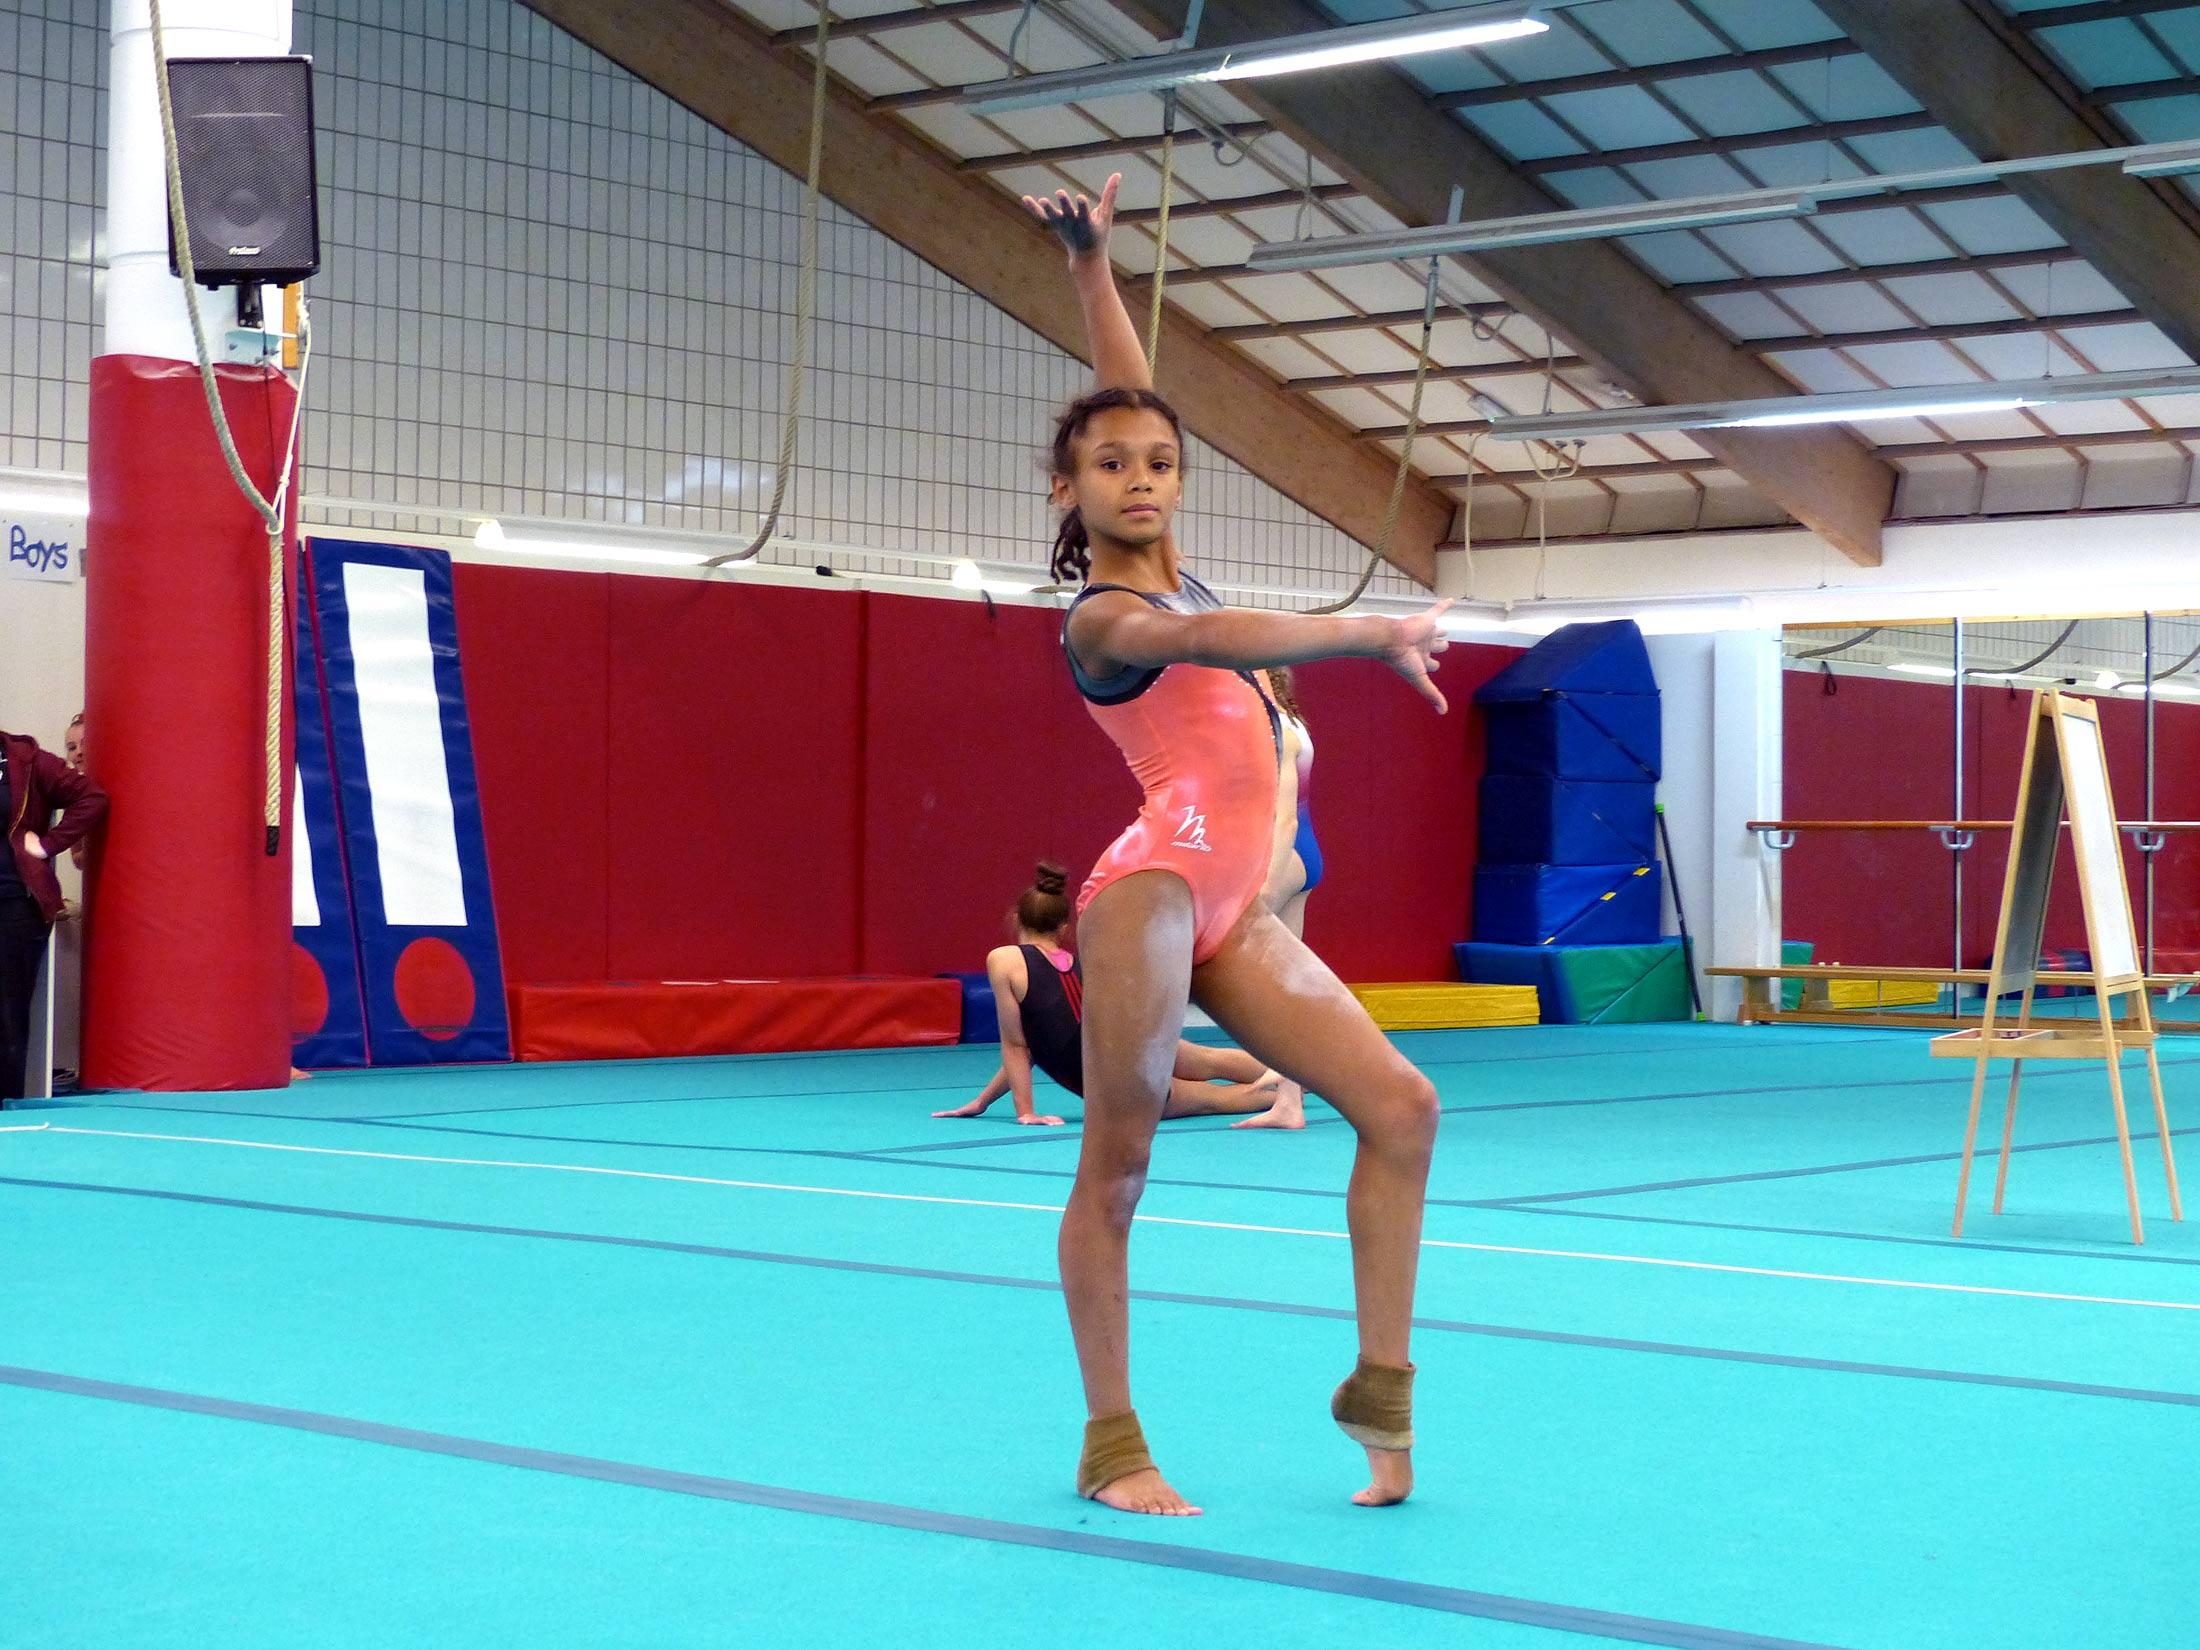 gymnast in pose on floor